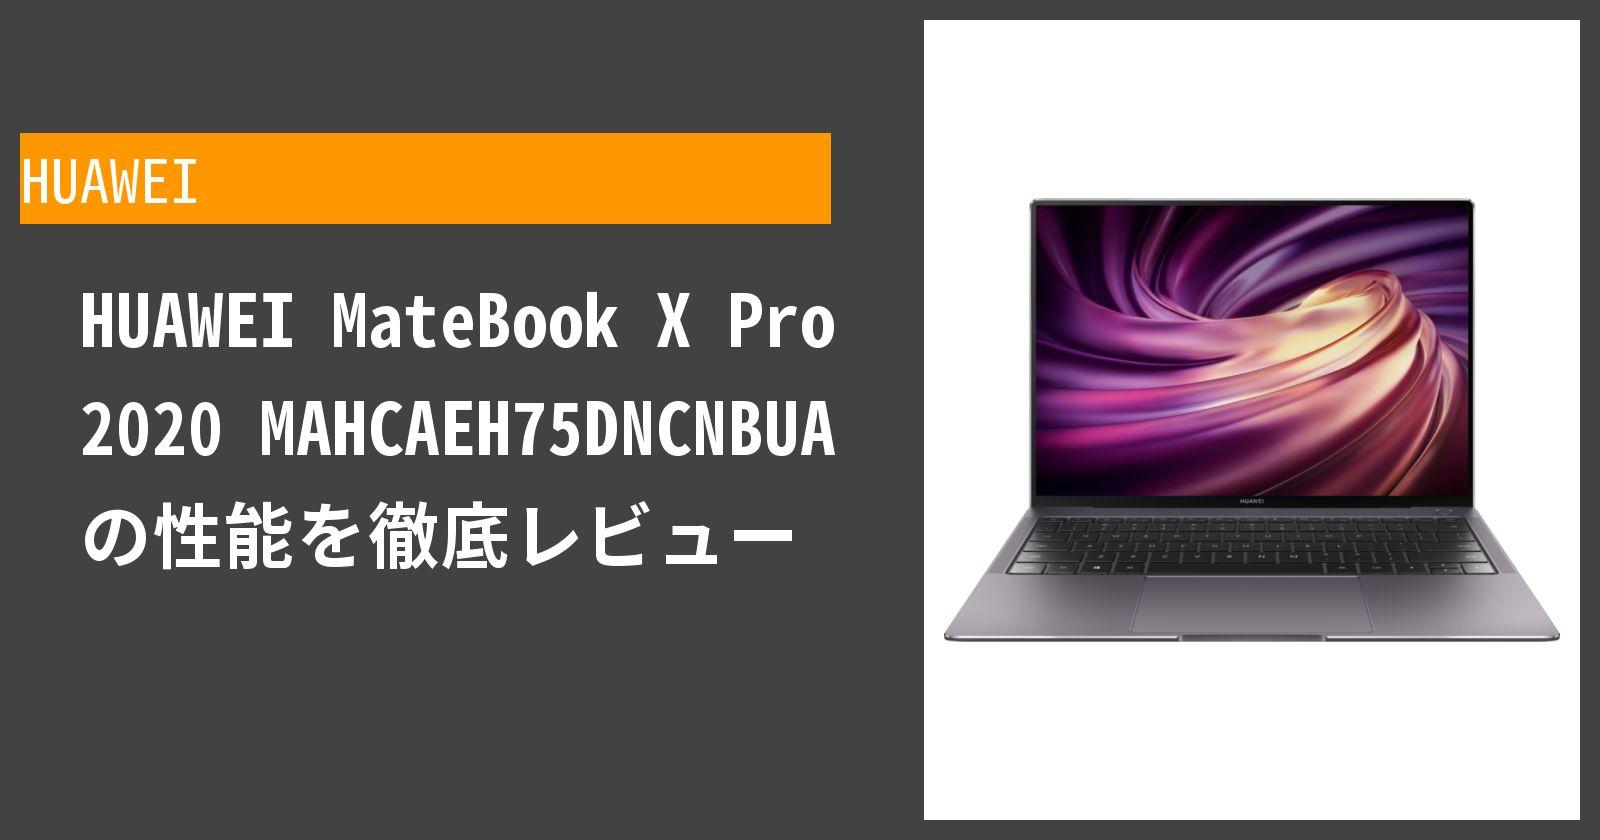 HUAWEI MateBook X Pro 2020 MAHCAEH75DNCNBUA の性能を徹底レビュー